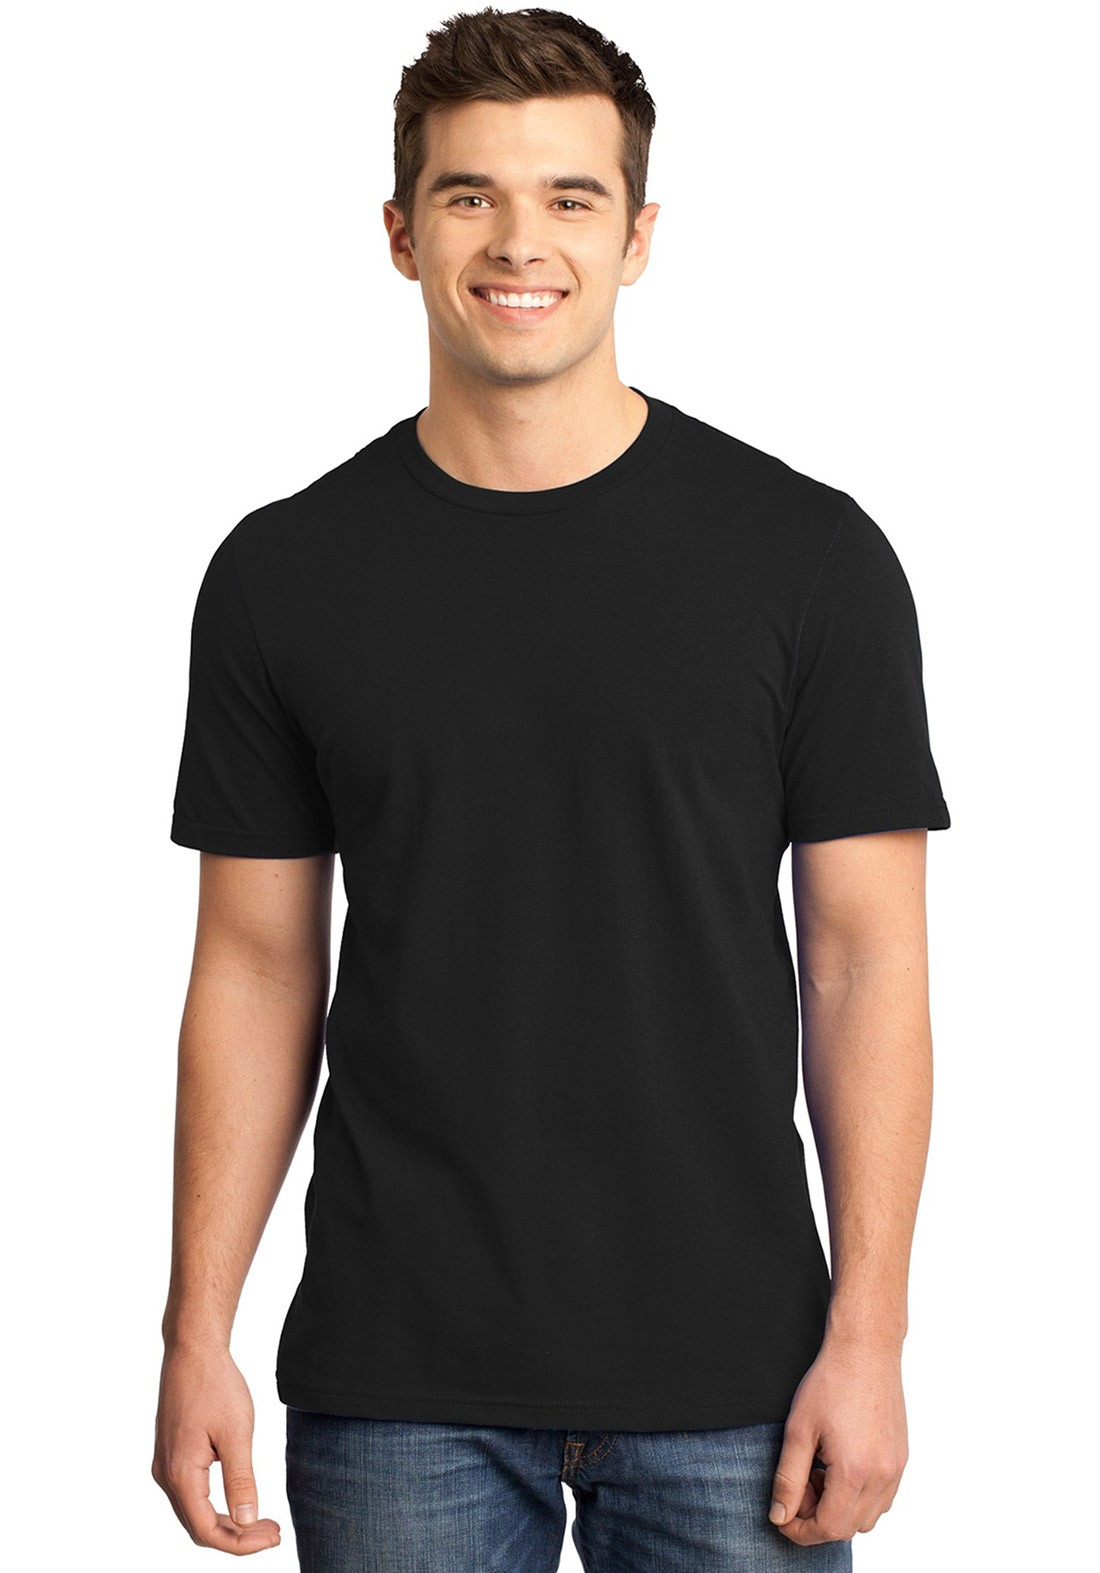 Camiseta Masculina Básica Lisa Algodão